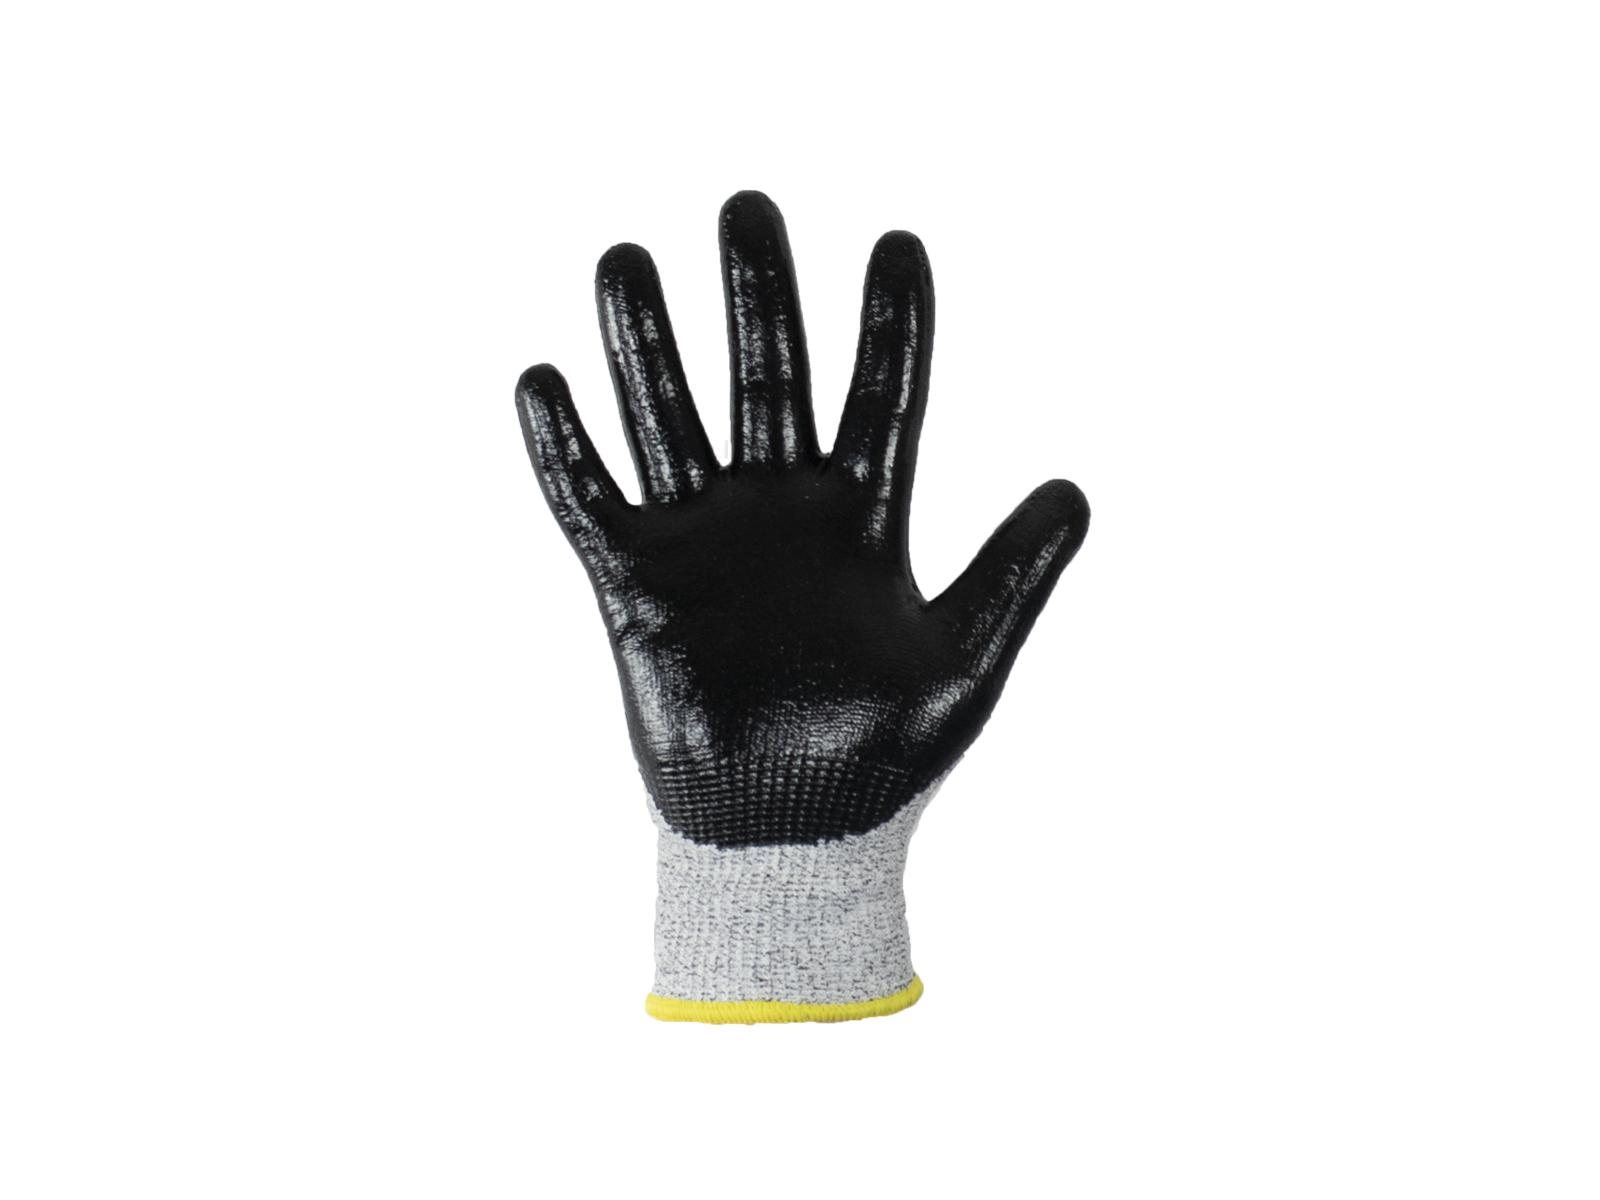 Samurai Cut 5 Safety Gloves w/ nitrile grip coating & soft seamless knitted yarn